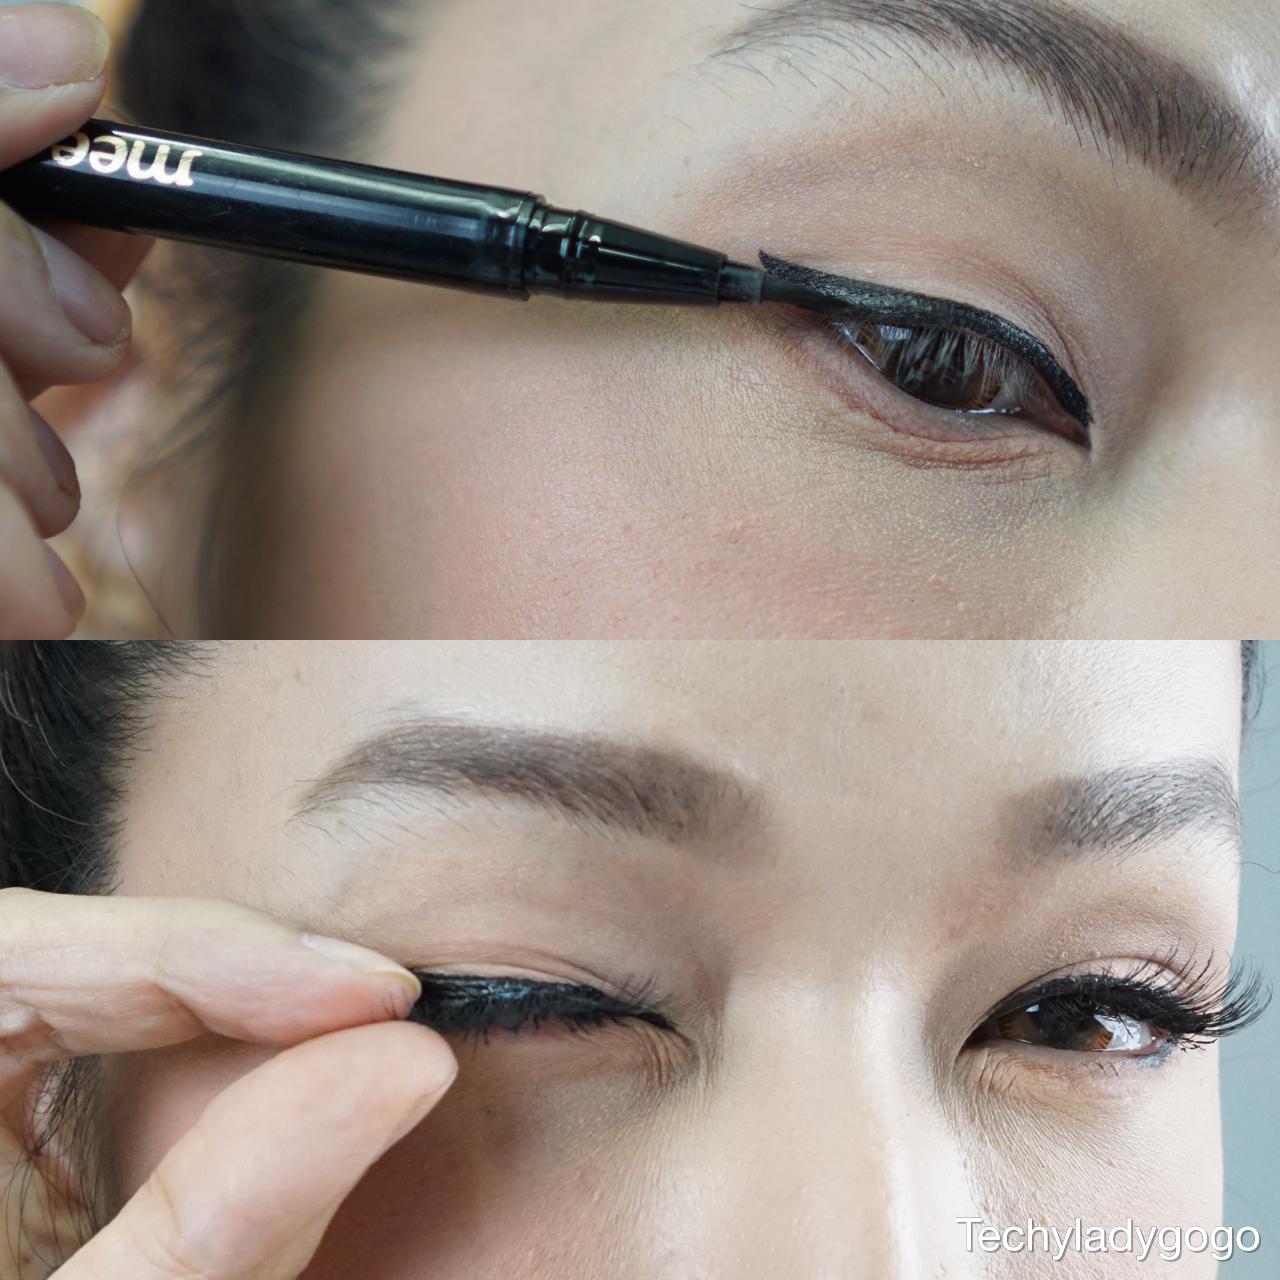 Sweet Valentine's Makeup Tutorial ฮาวทูแต่งหน้าสวยหวาน น้ำตาลเรียกเจ๊ mee eyeliner